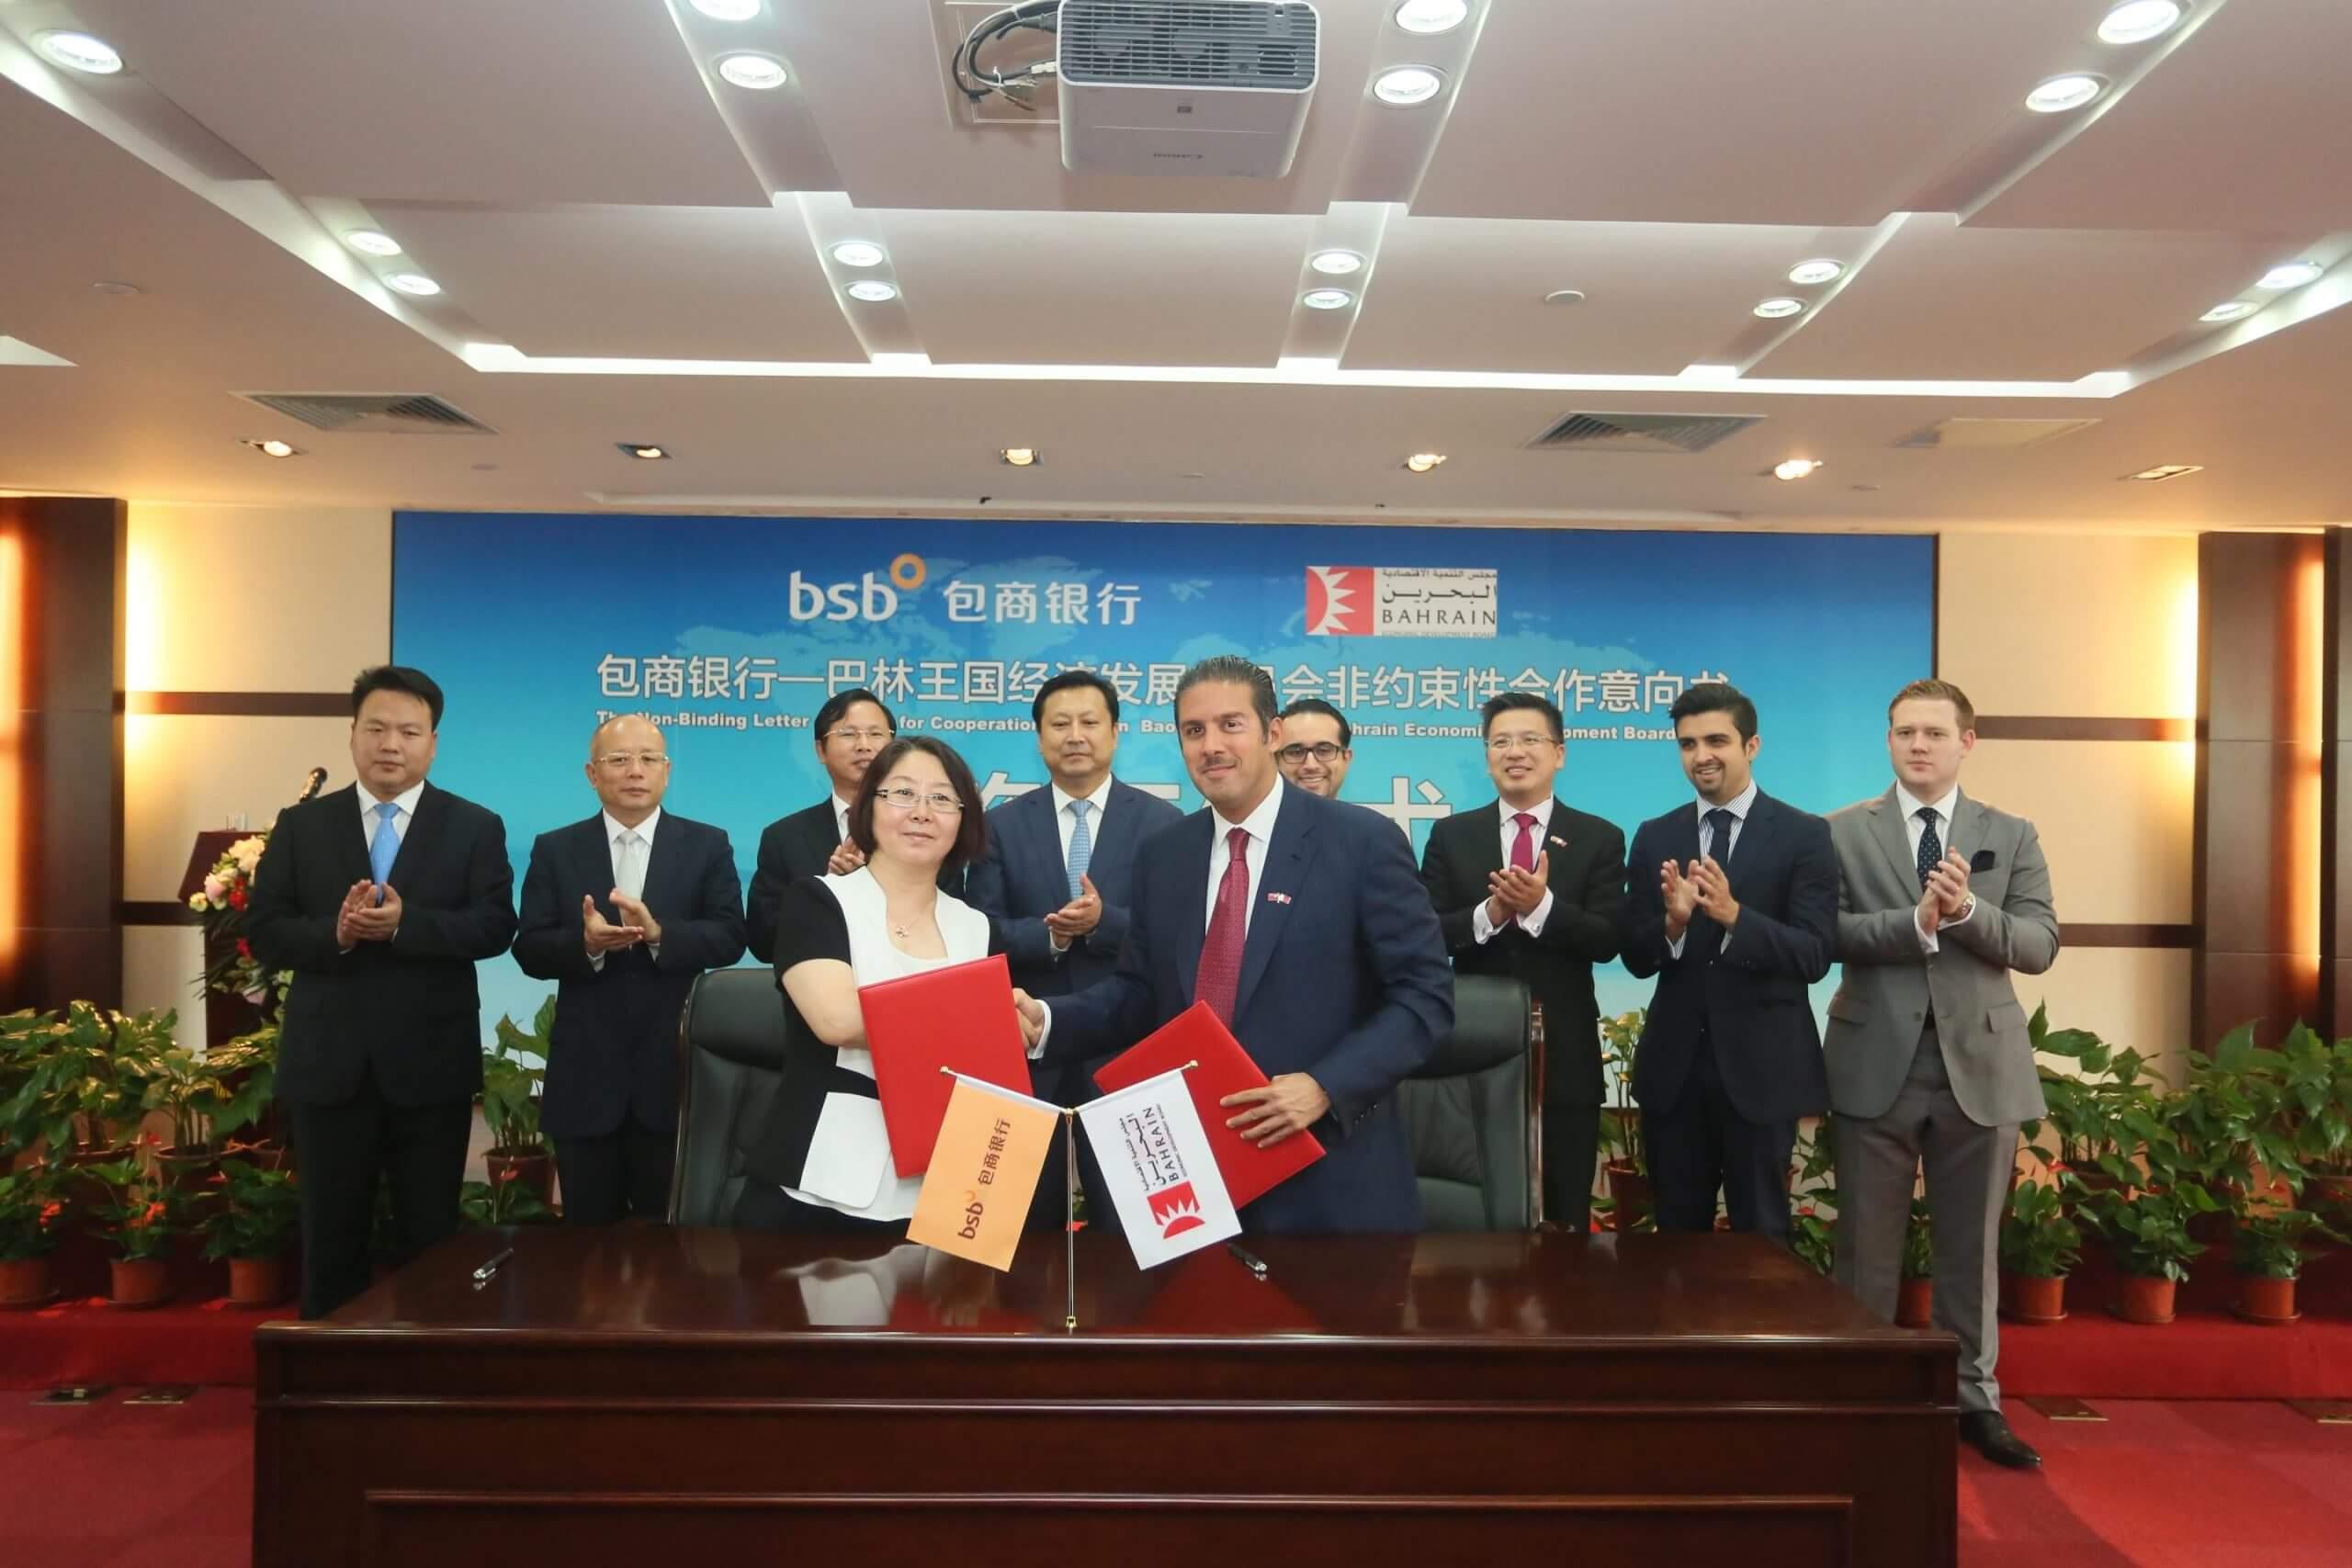 Baoshang Bank announces plans to establish operations in Bahrain